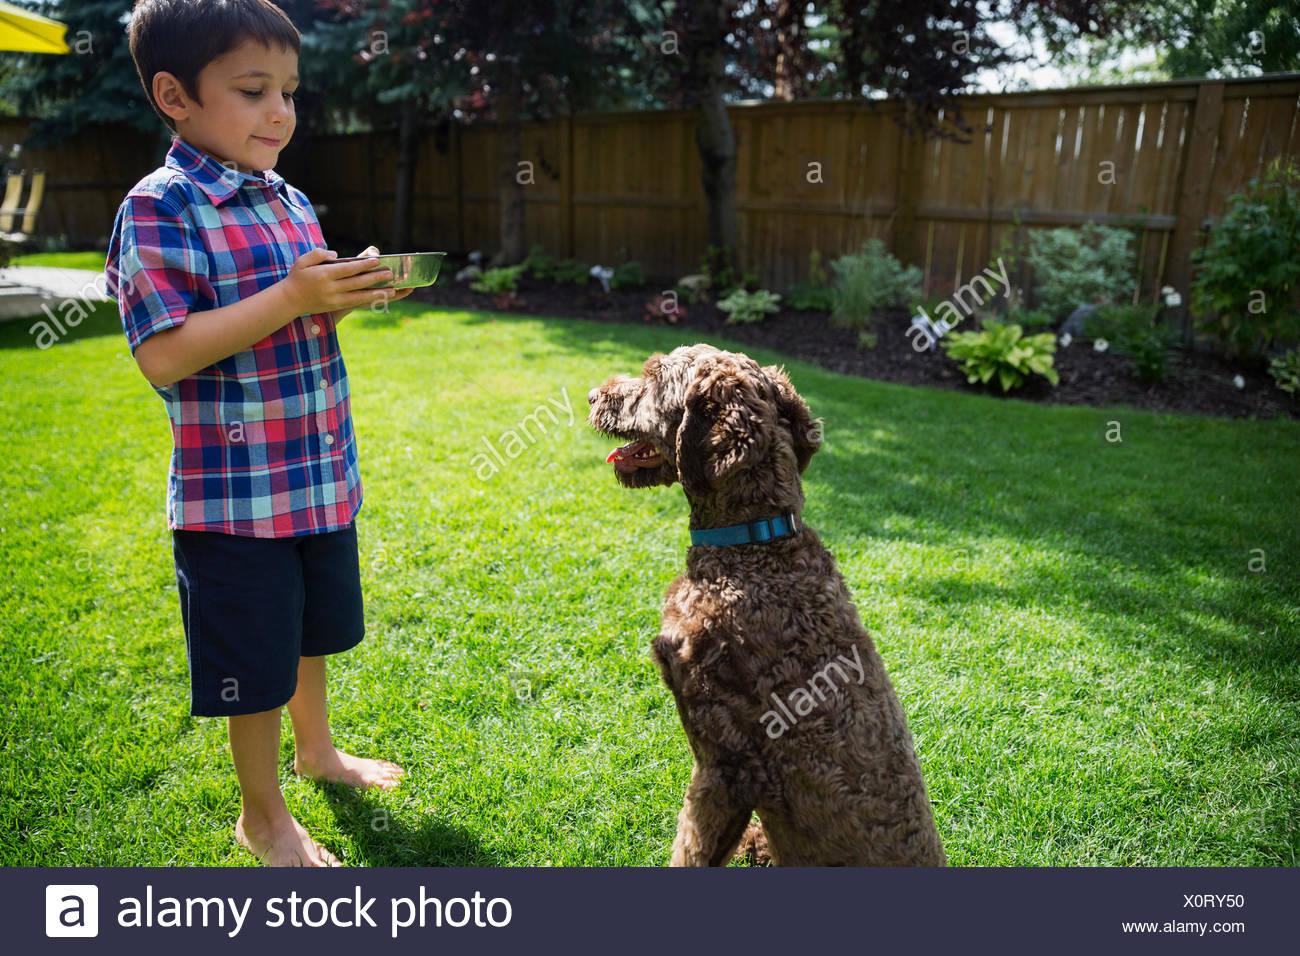 Boy feeding dog on sunny lawn - Stock Image